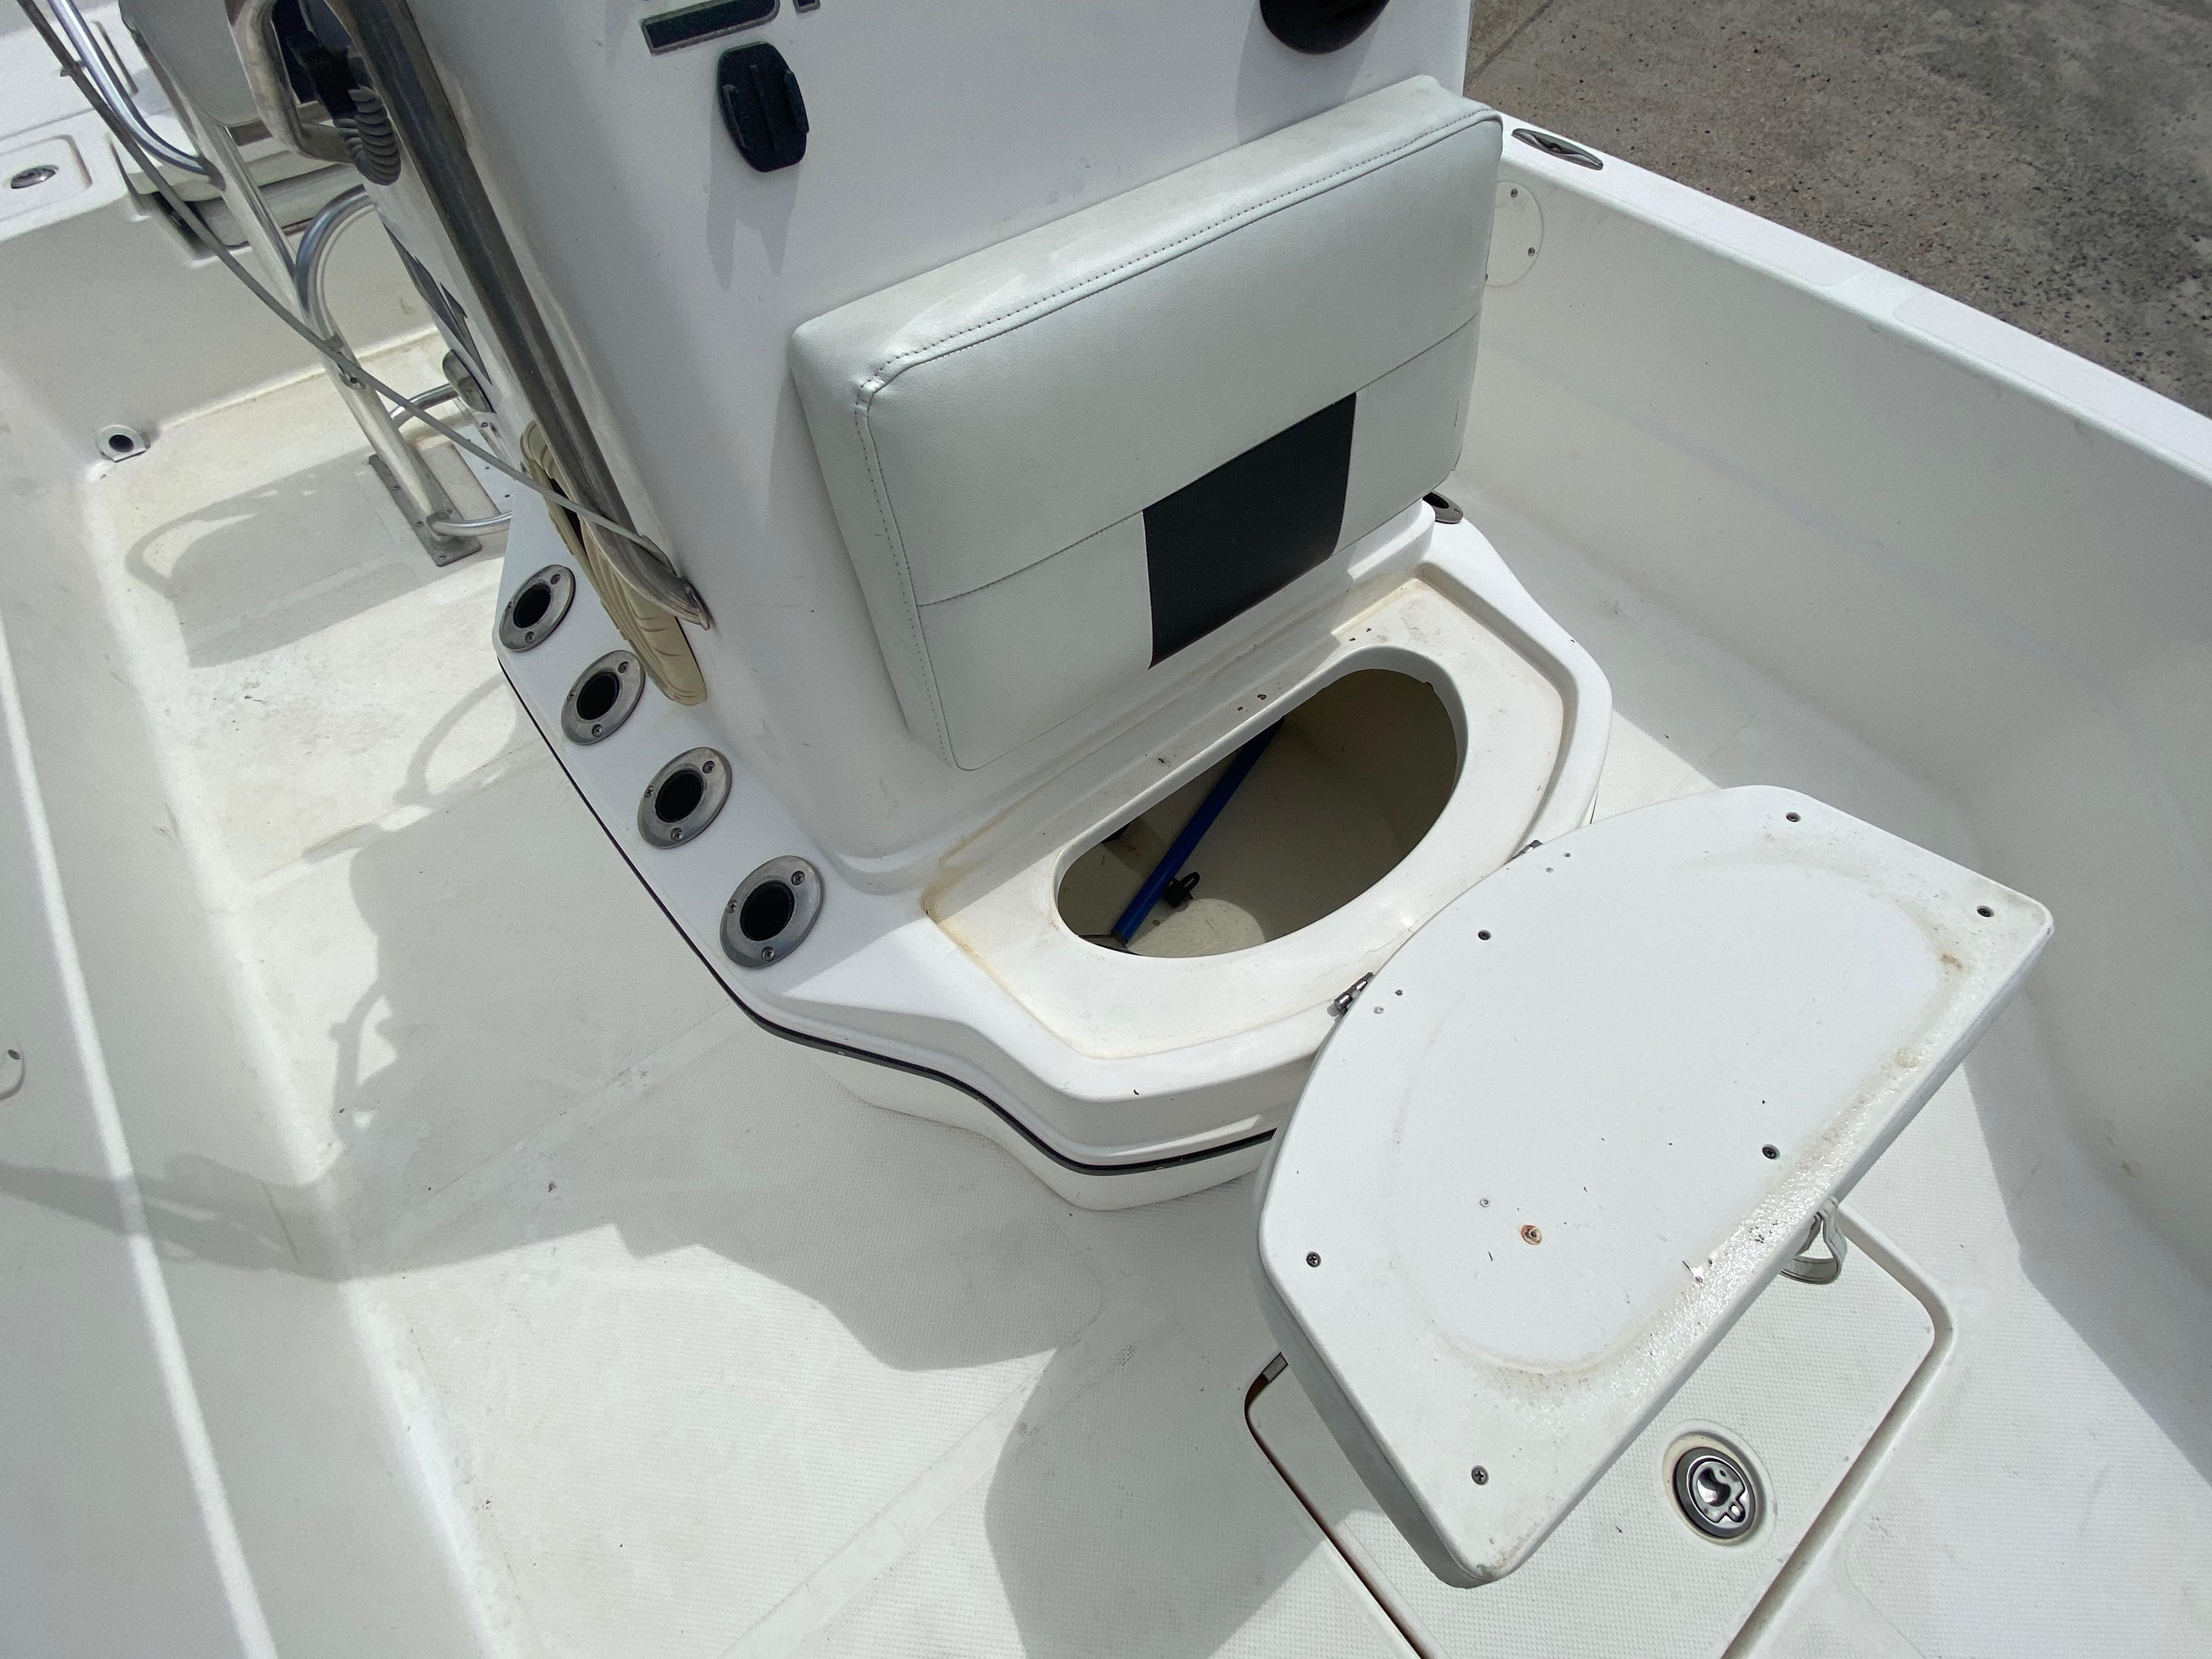 2010 Skeeter boat for sale, model of the boat is ZX 24V & Image # 5 of 18